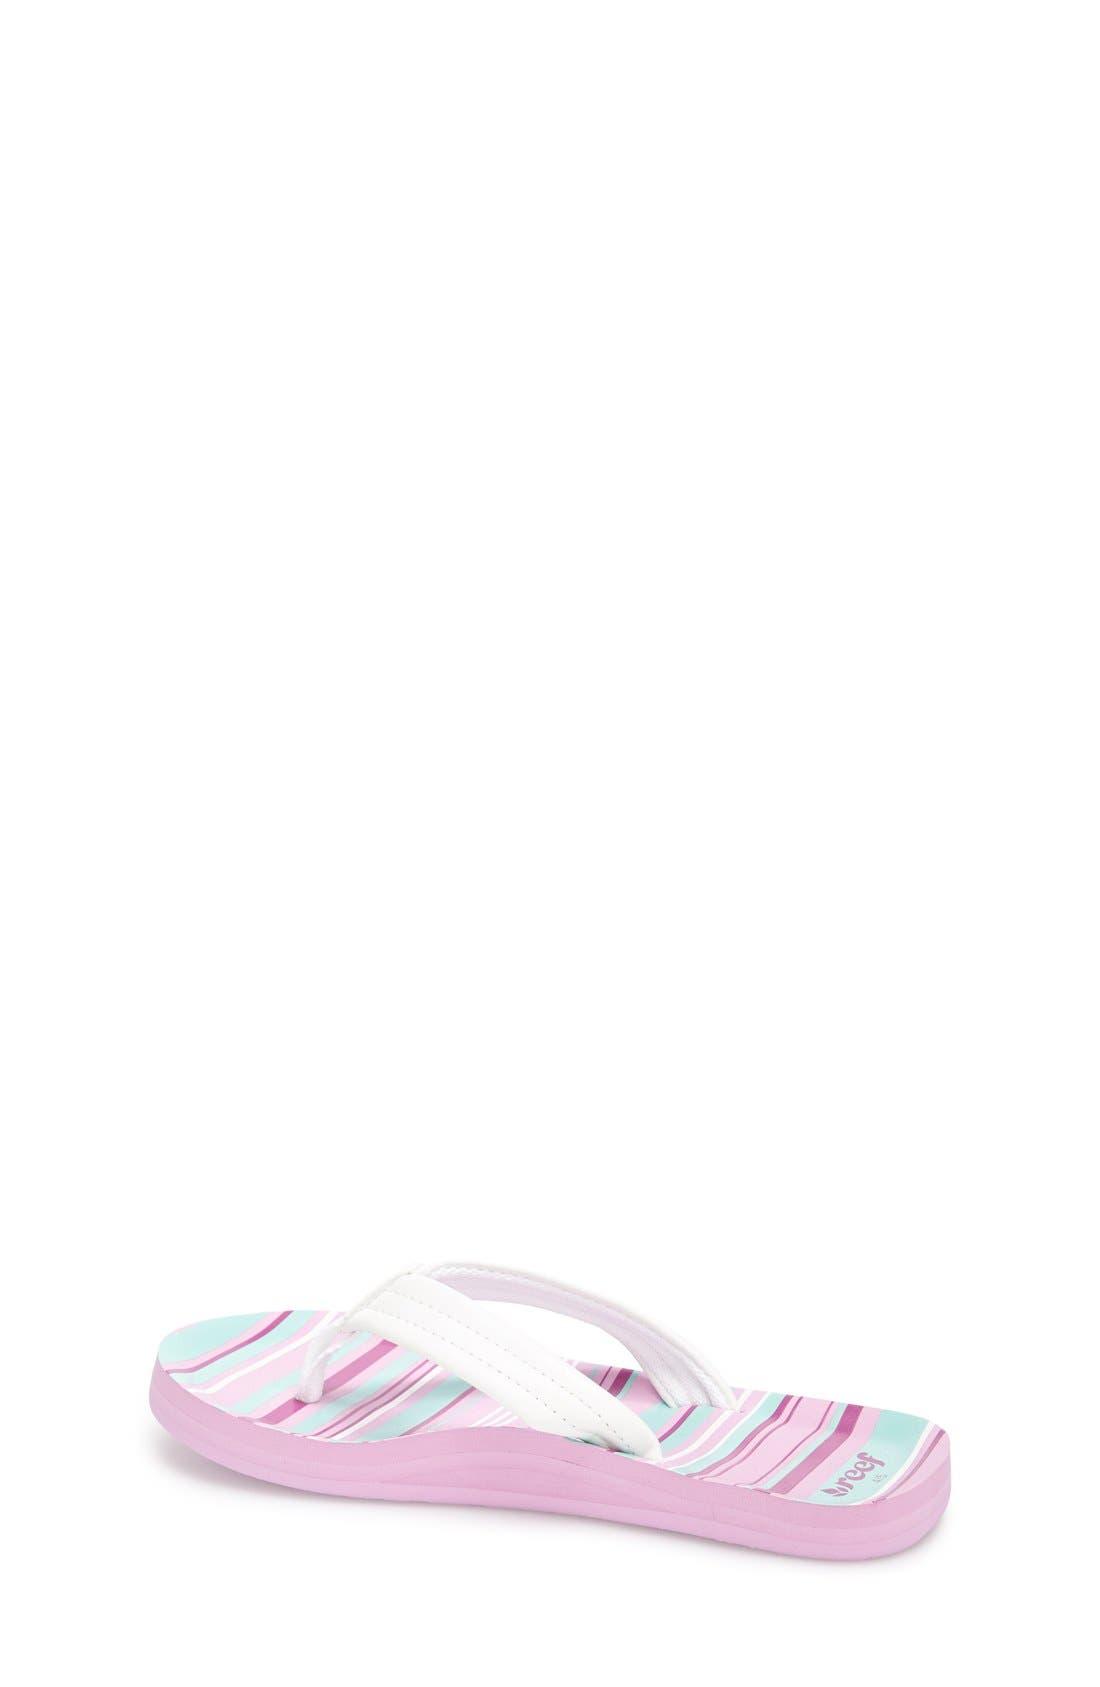 'Little Ahi' Thong Sandal,                             Alternate thumbnail 30, color,